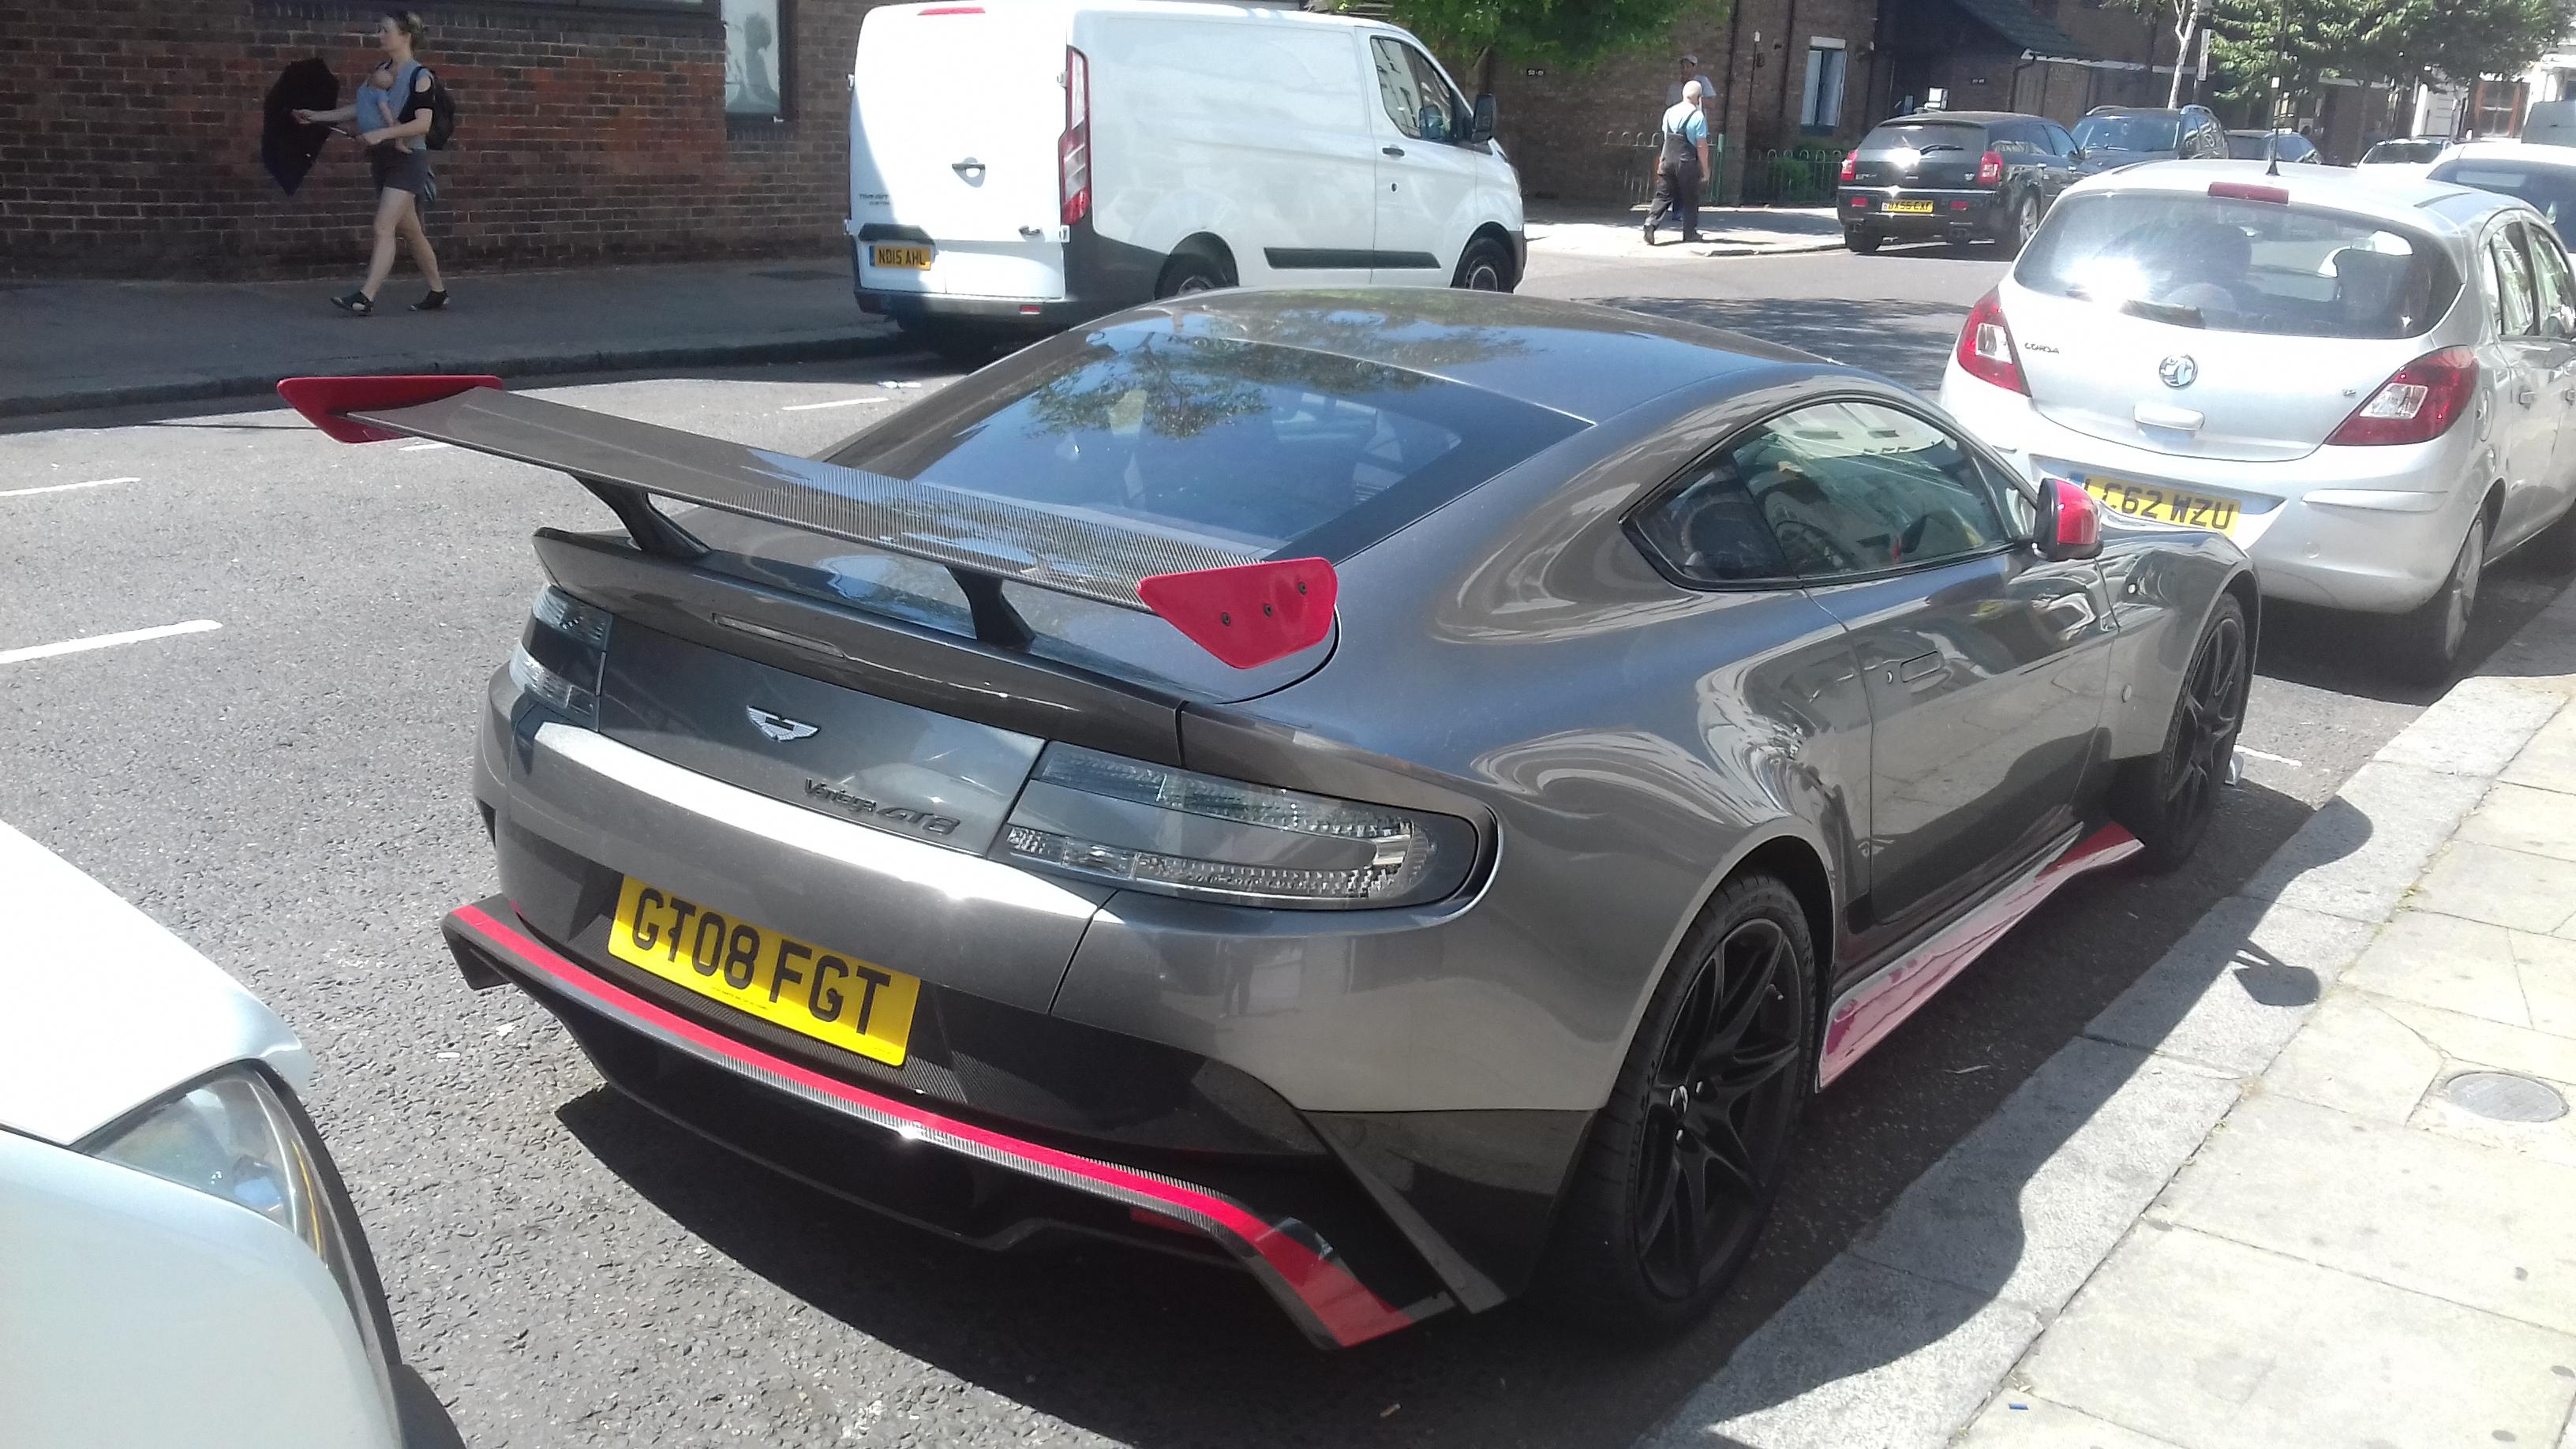 2018 Aston Martin Vantage Gt8 Totallycars Club